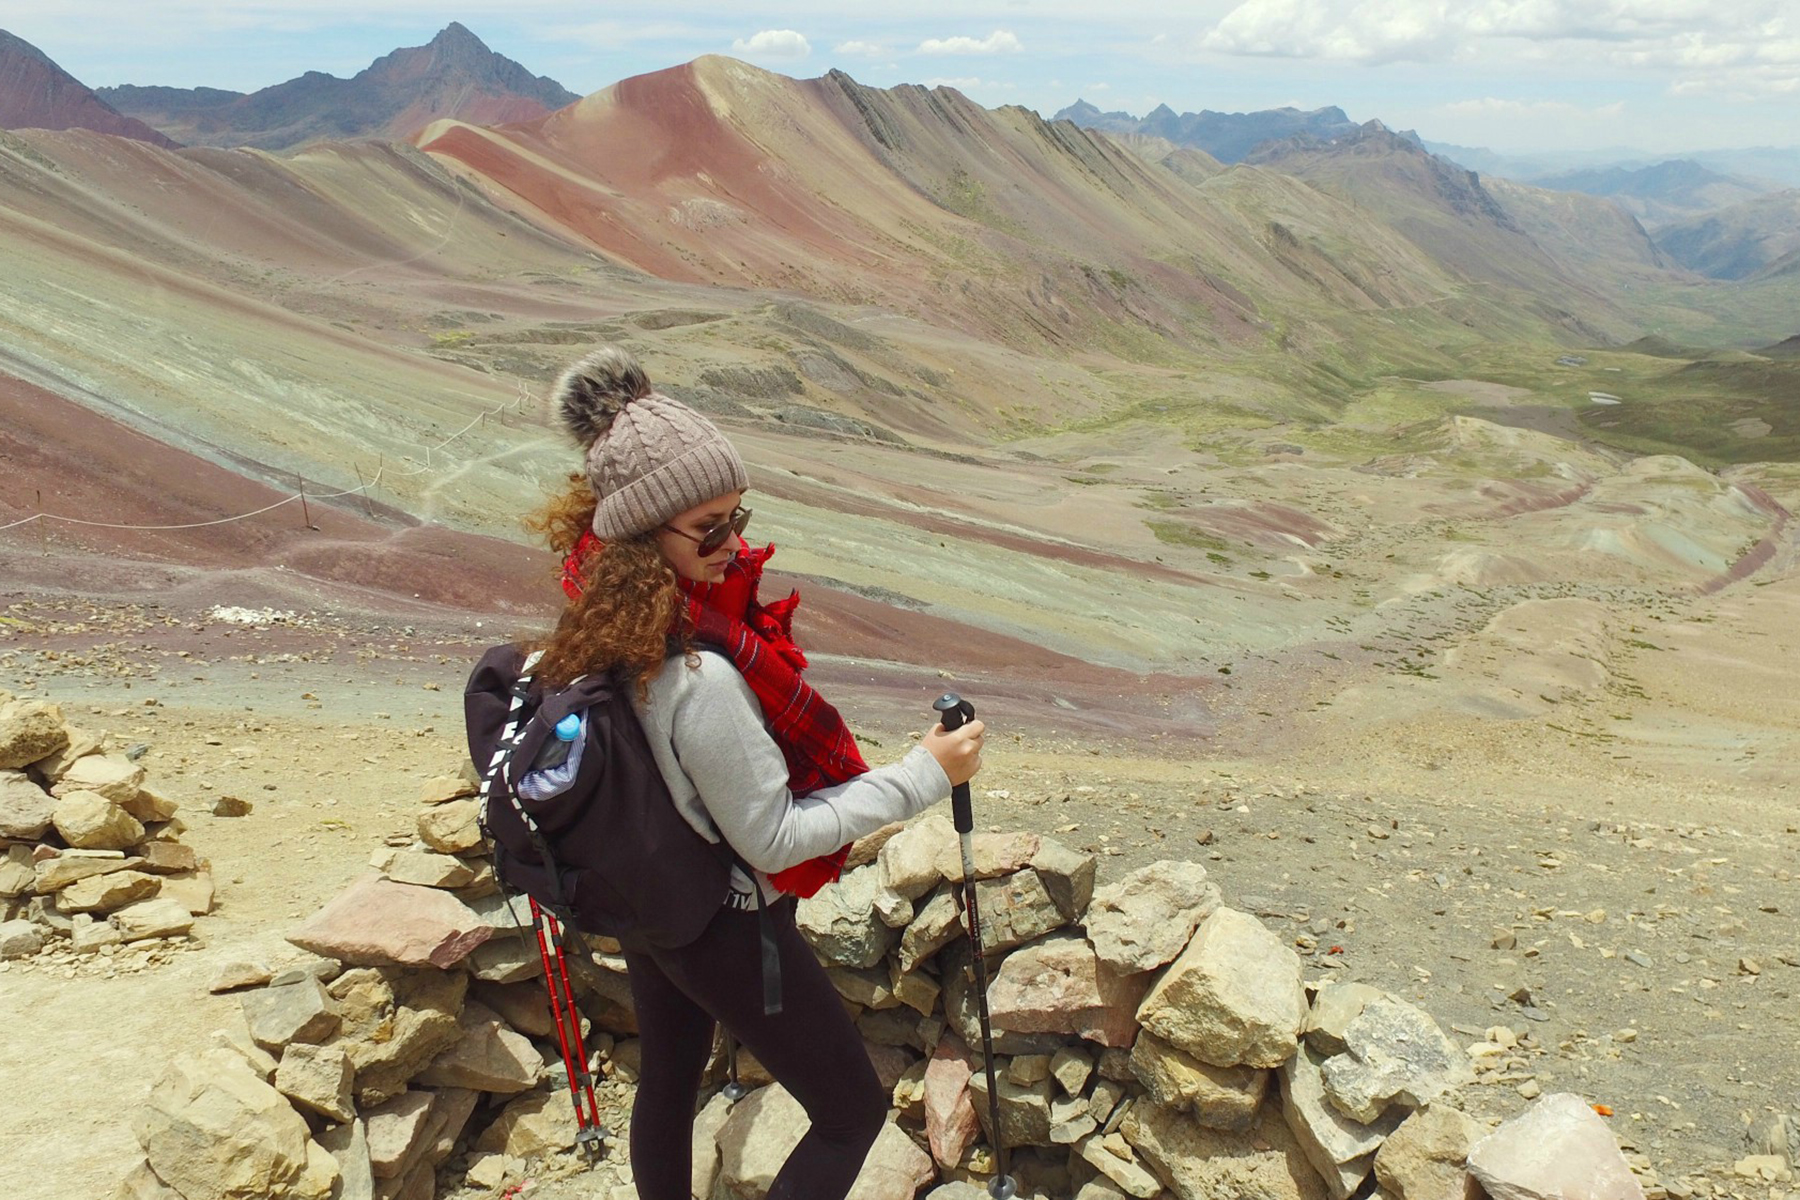 Peru po stopách dúhy - dúhová hora Vinicunca Rainbow Mountain